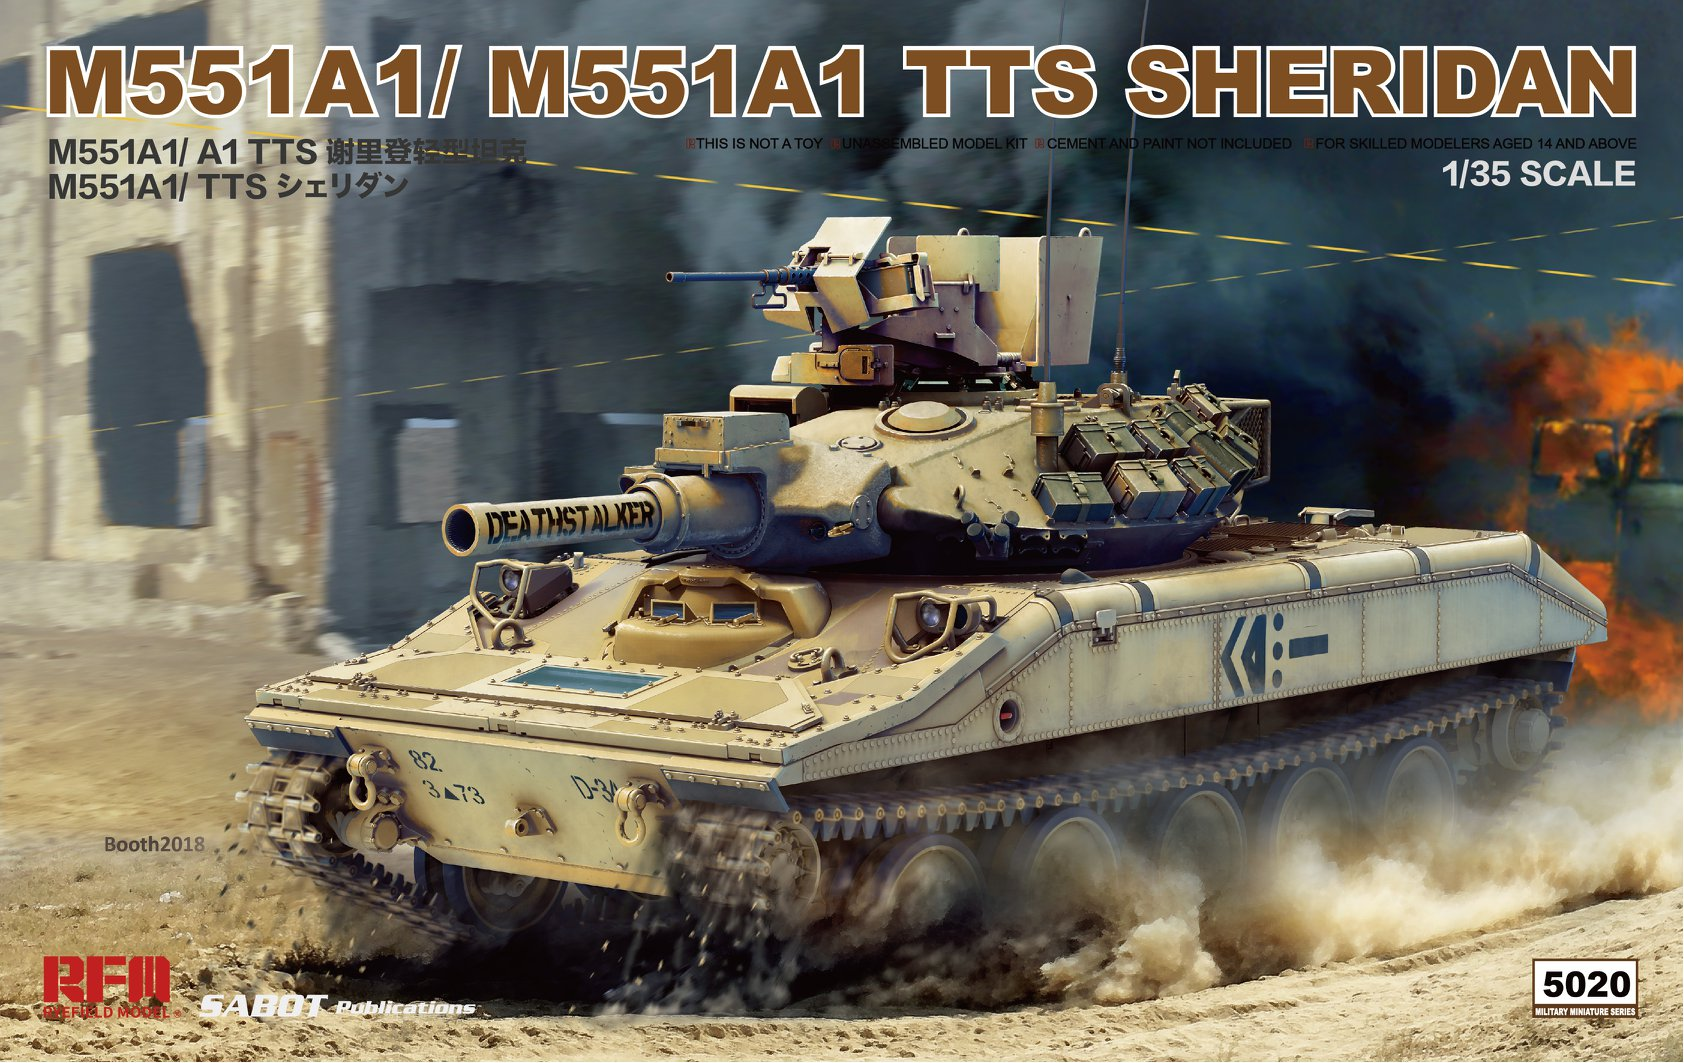 RYEFIELD MODEL # RM-5020 1-35 M551A1_M551A1 TTS SHERIDAN.jpg